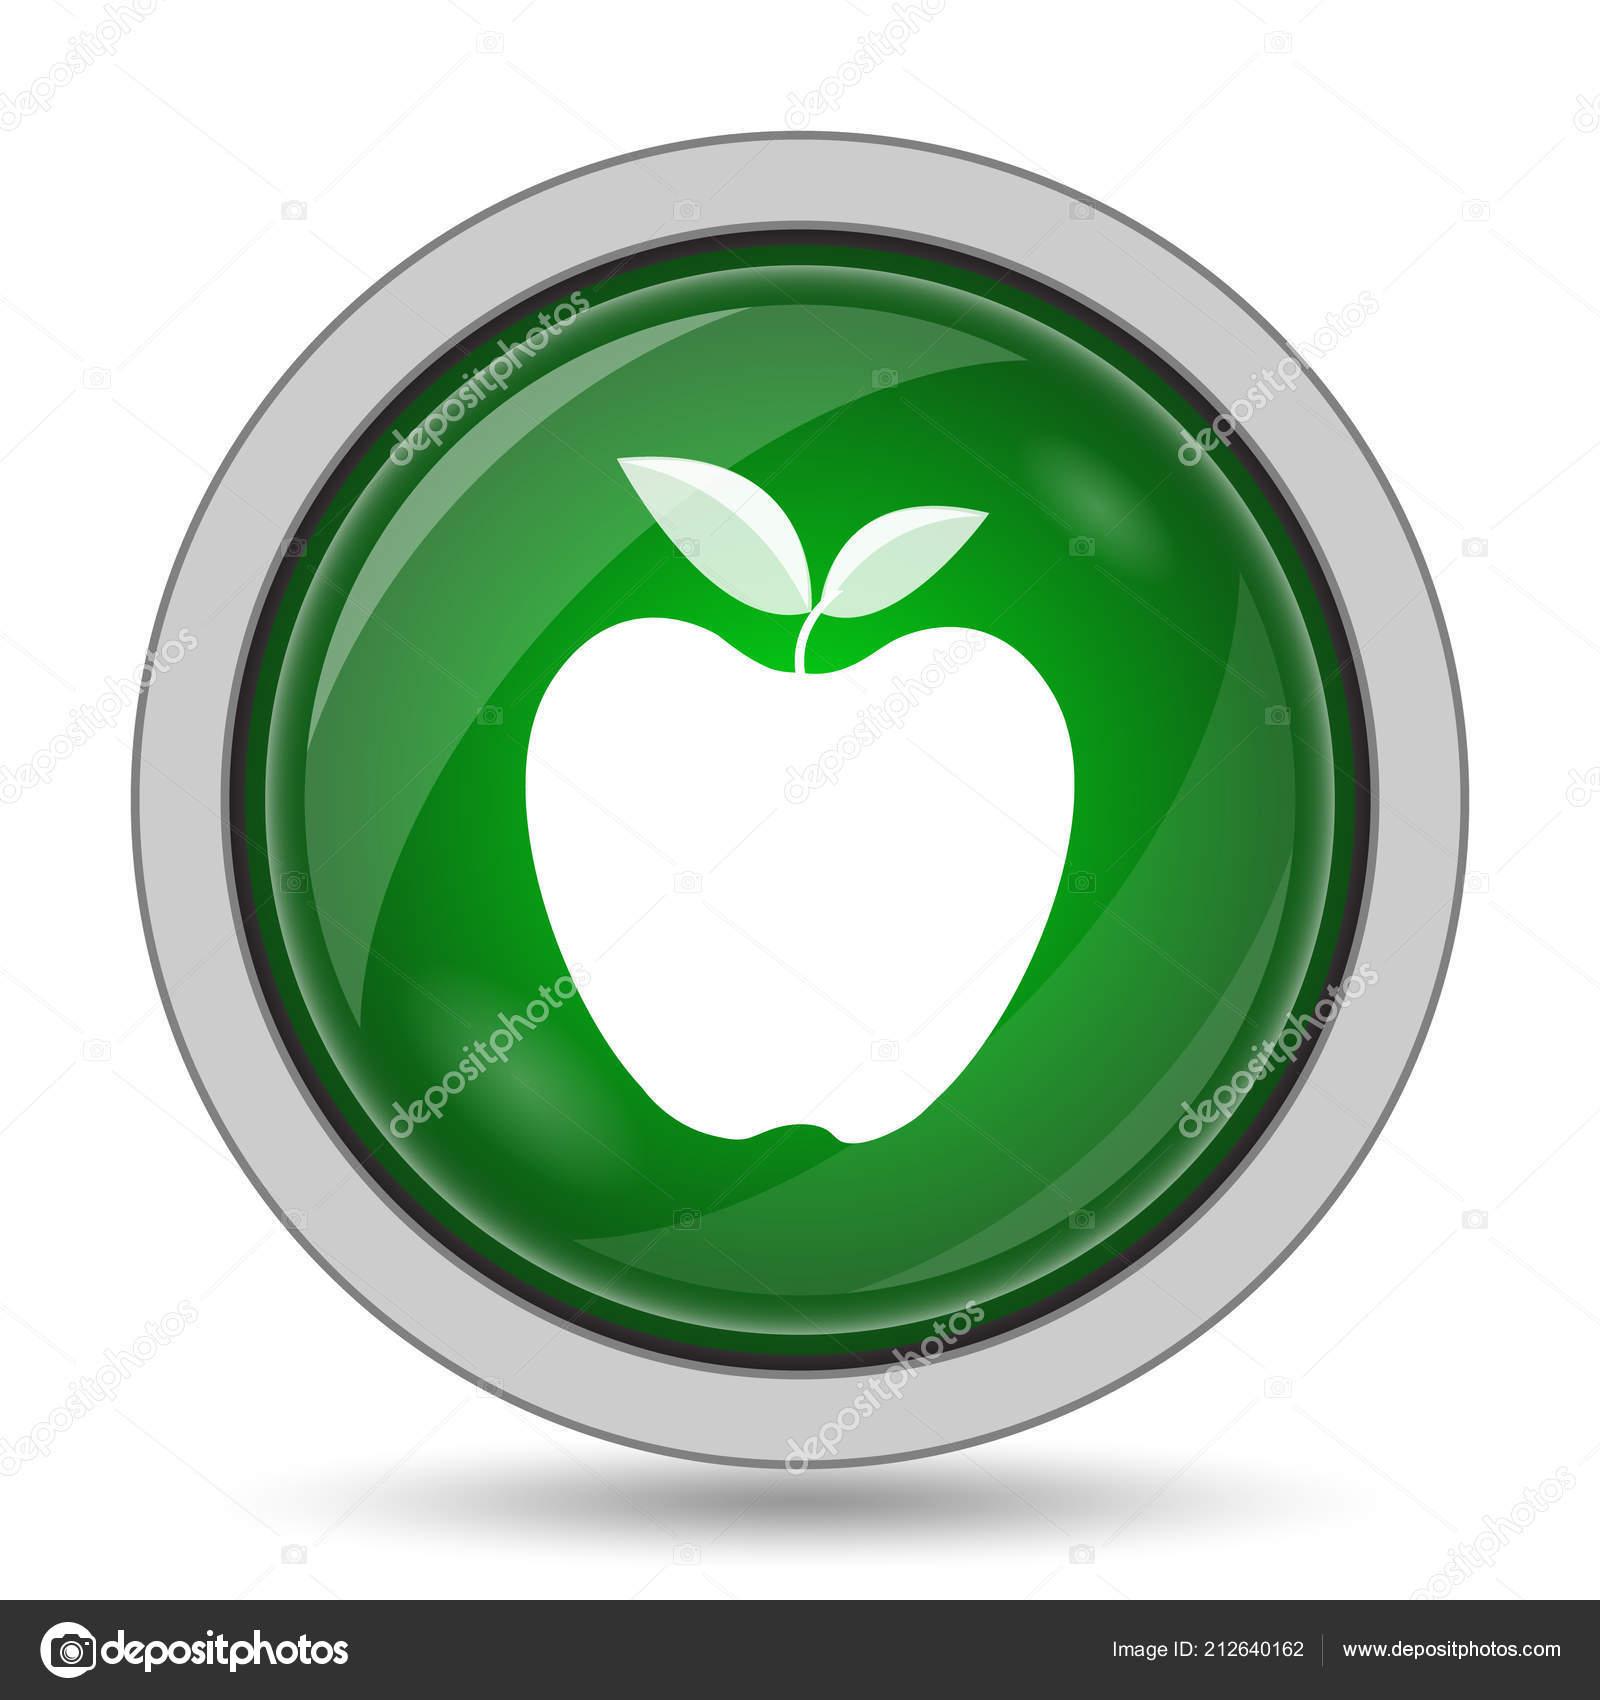 Apple Symbol Stockfoto Valentint 212640162